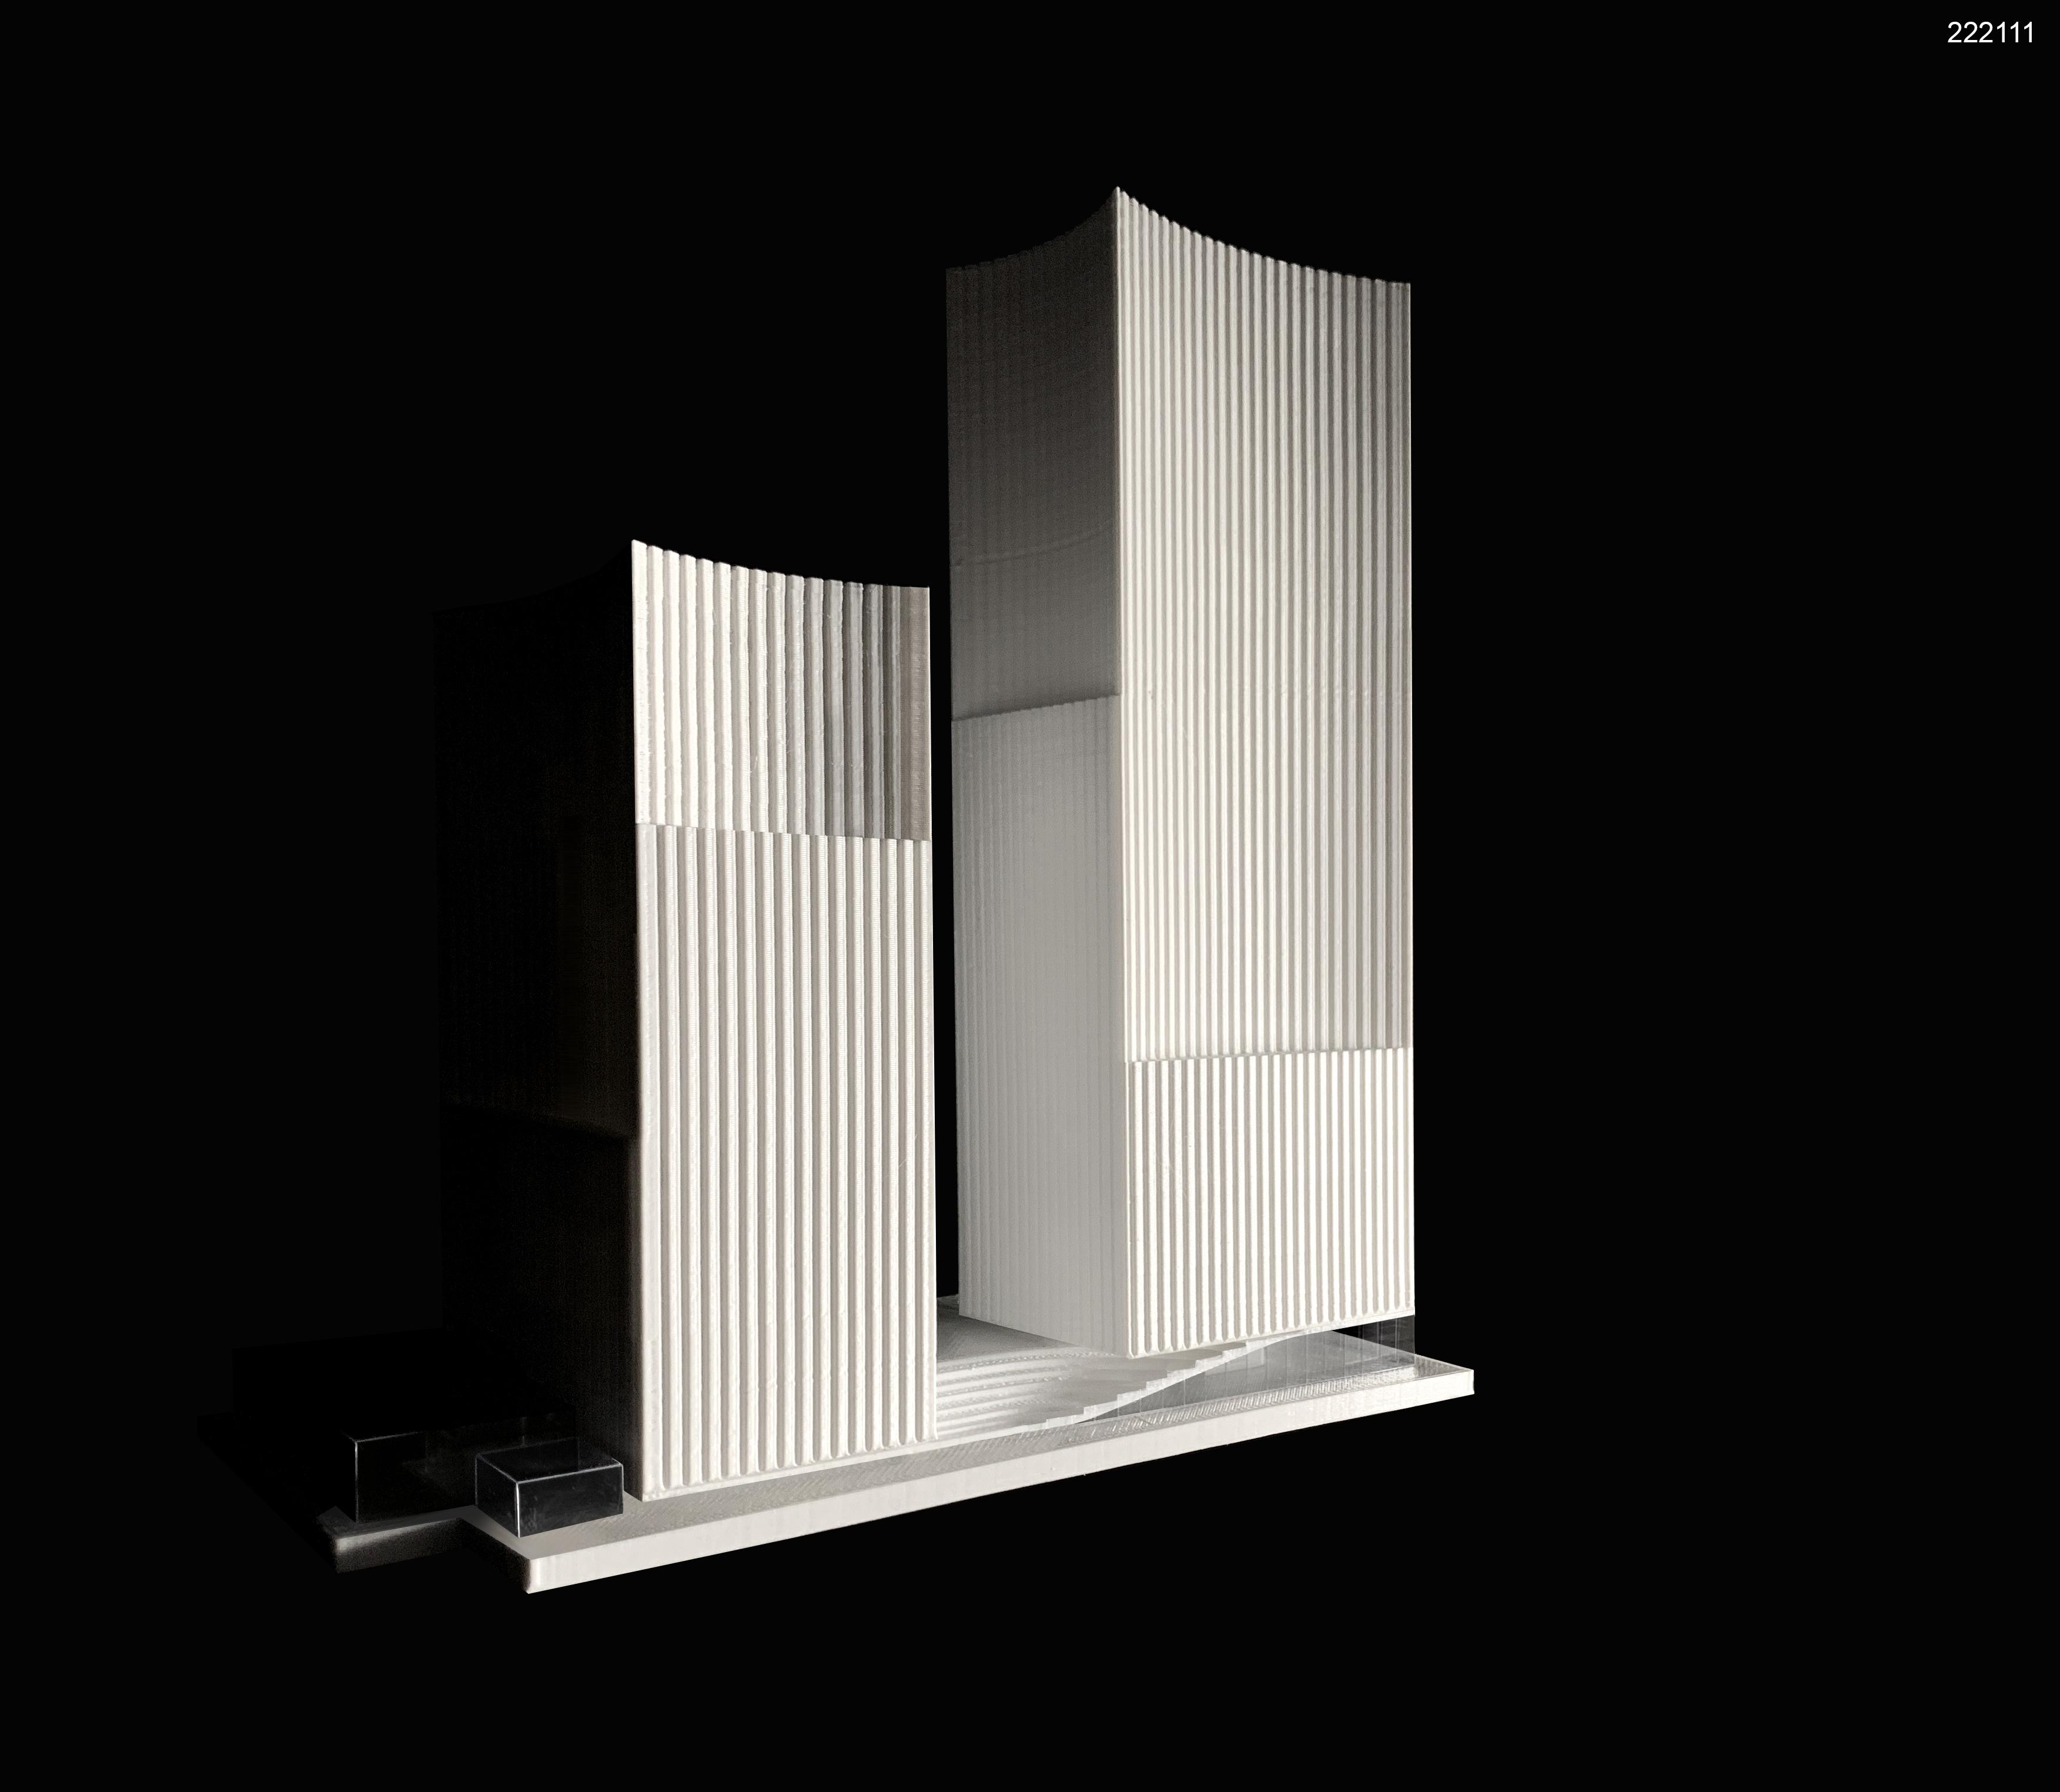 "Projektas devizu ""222111"" (arch. J.Porvaneckaitė, A.Dagelis, S.Čalnaras, A.Zenkevičiūtė), 2-oji vieta, 8.000 Eur. premija"